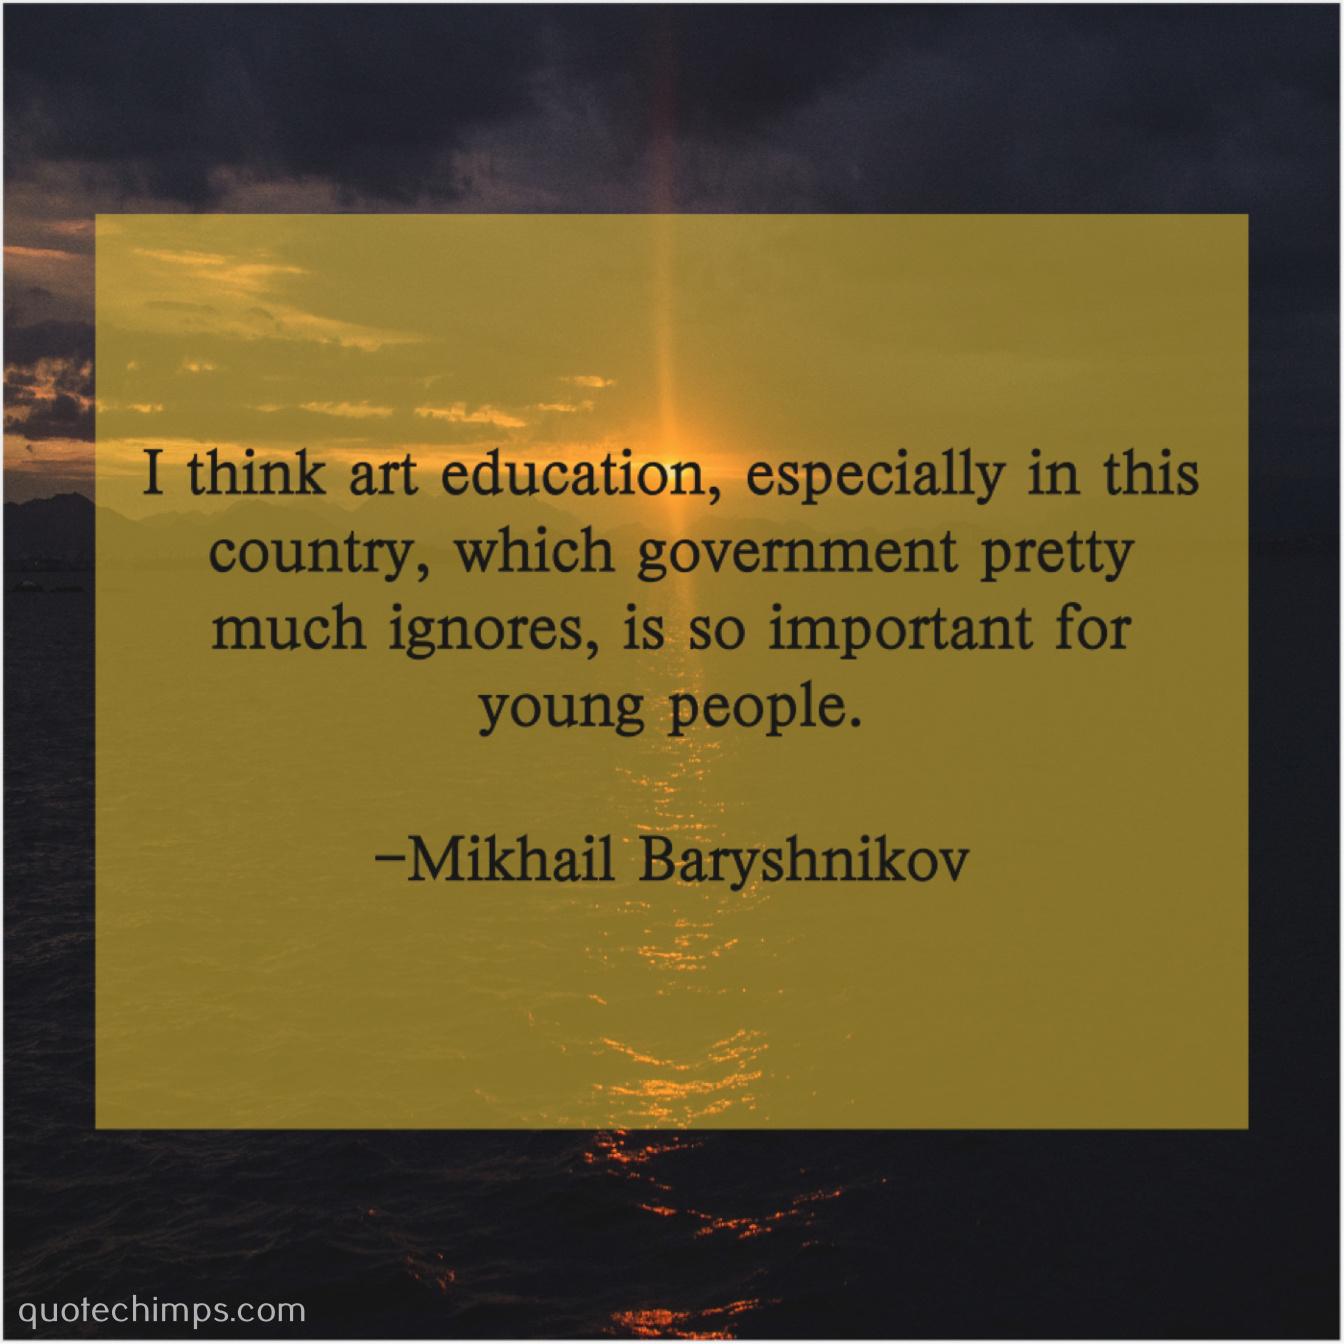 Mikhail Baryshnikov I Think Art Education Especially